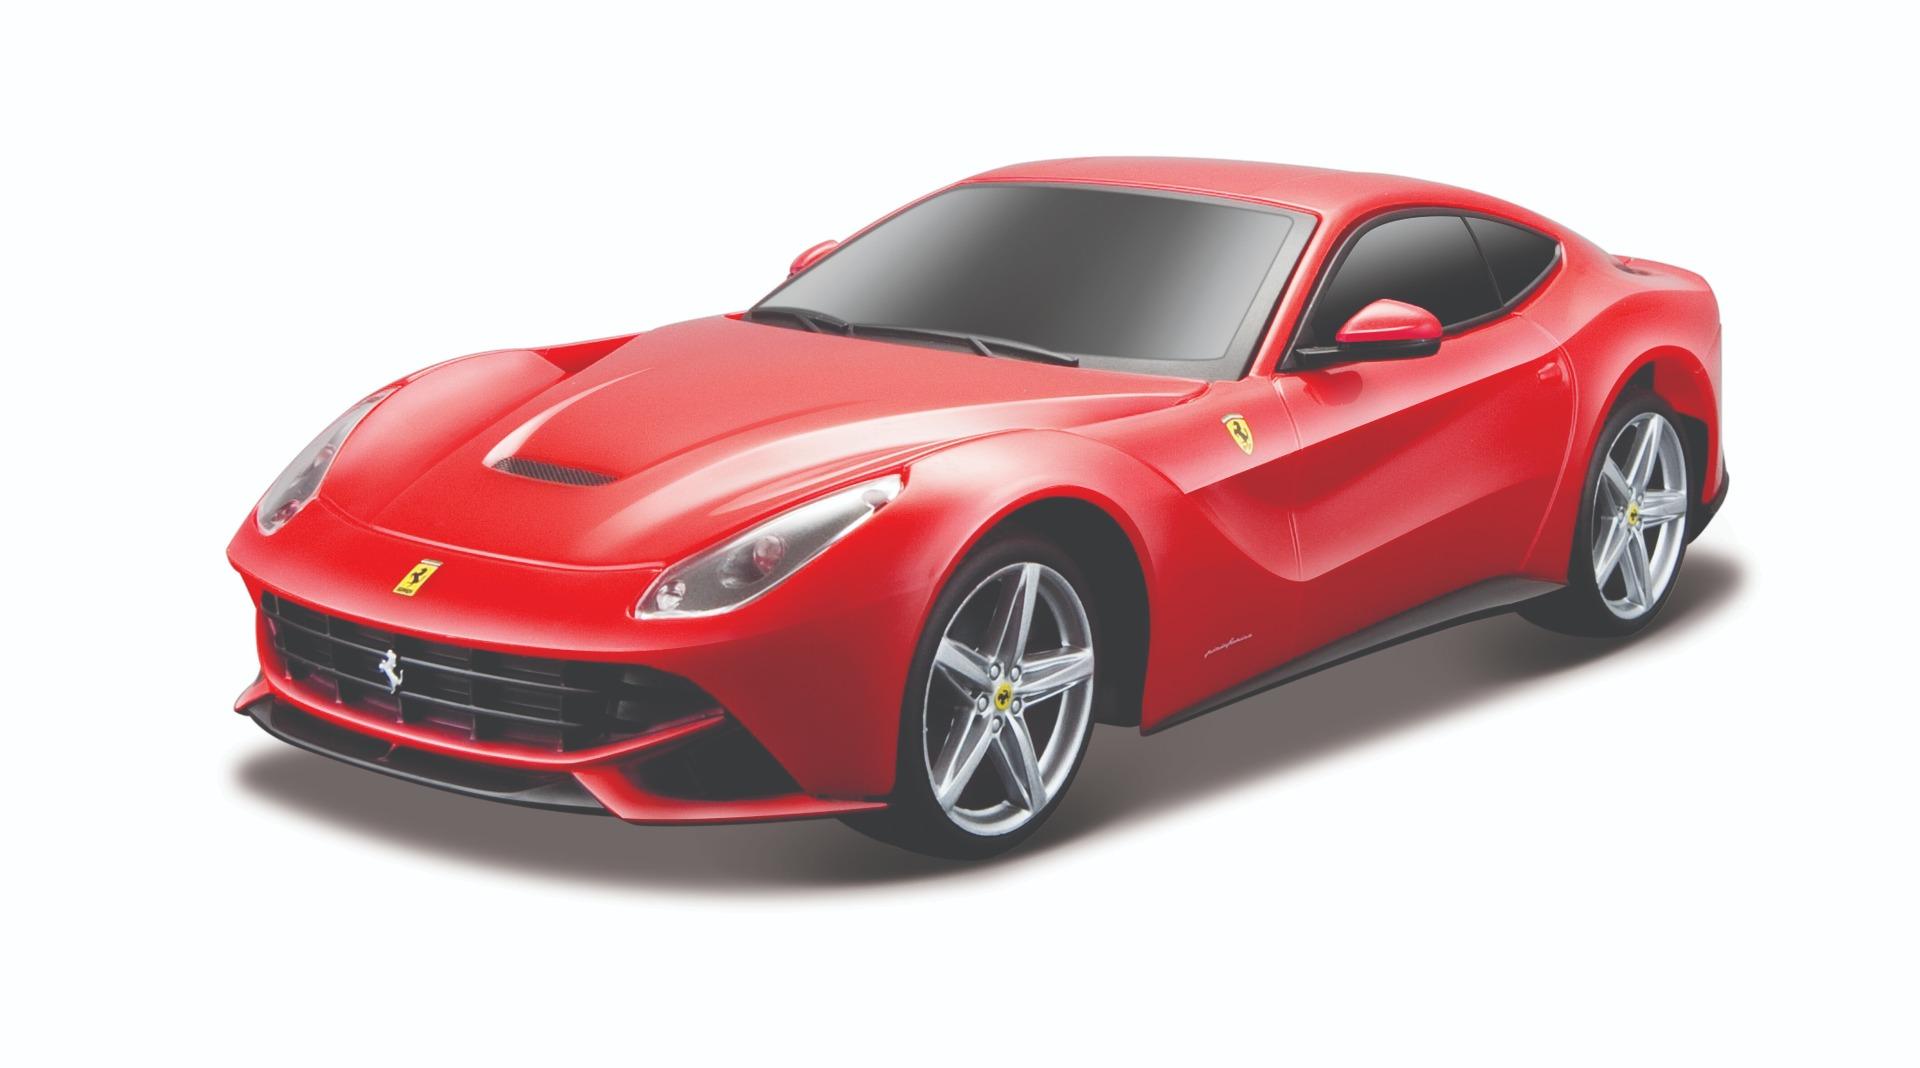 Masinuta Maisto Ferrari F12 Berlinetta. 1:24